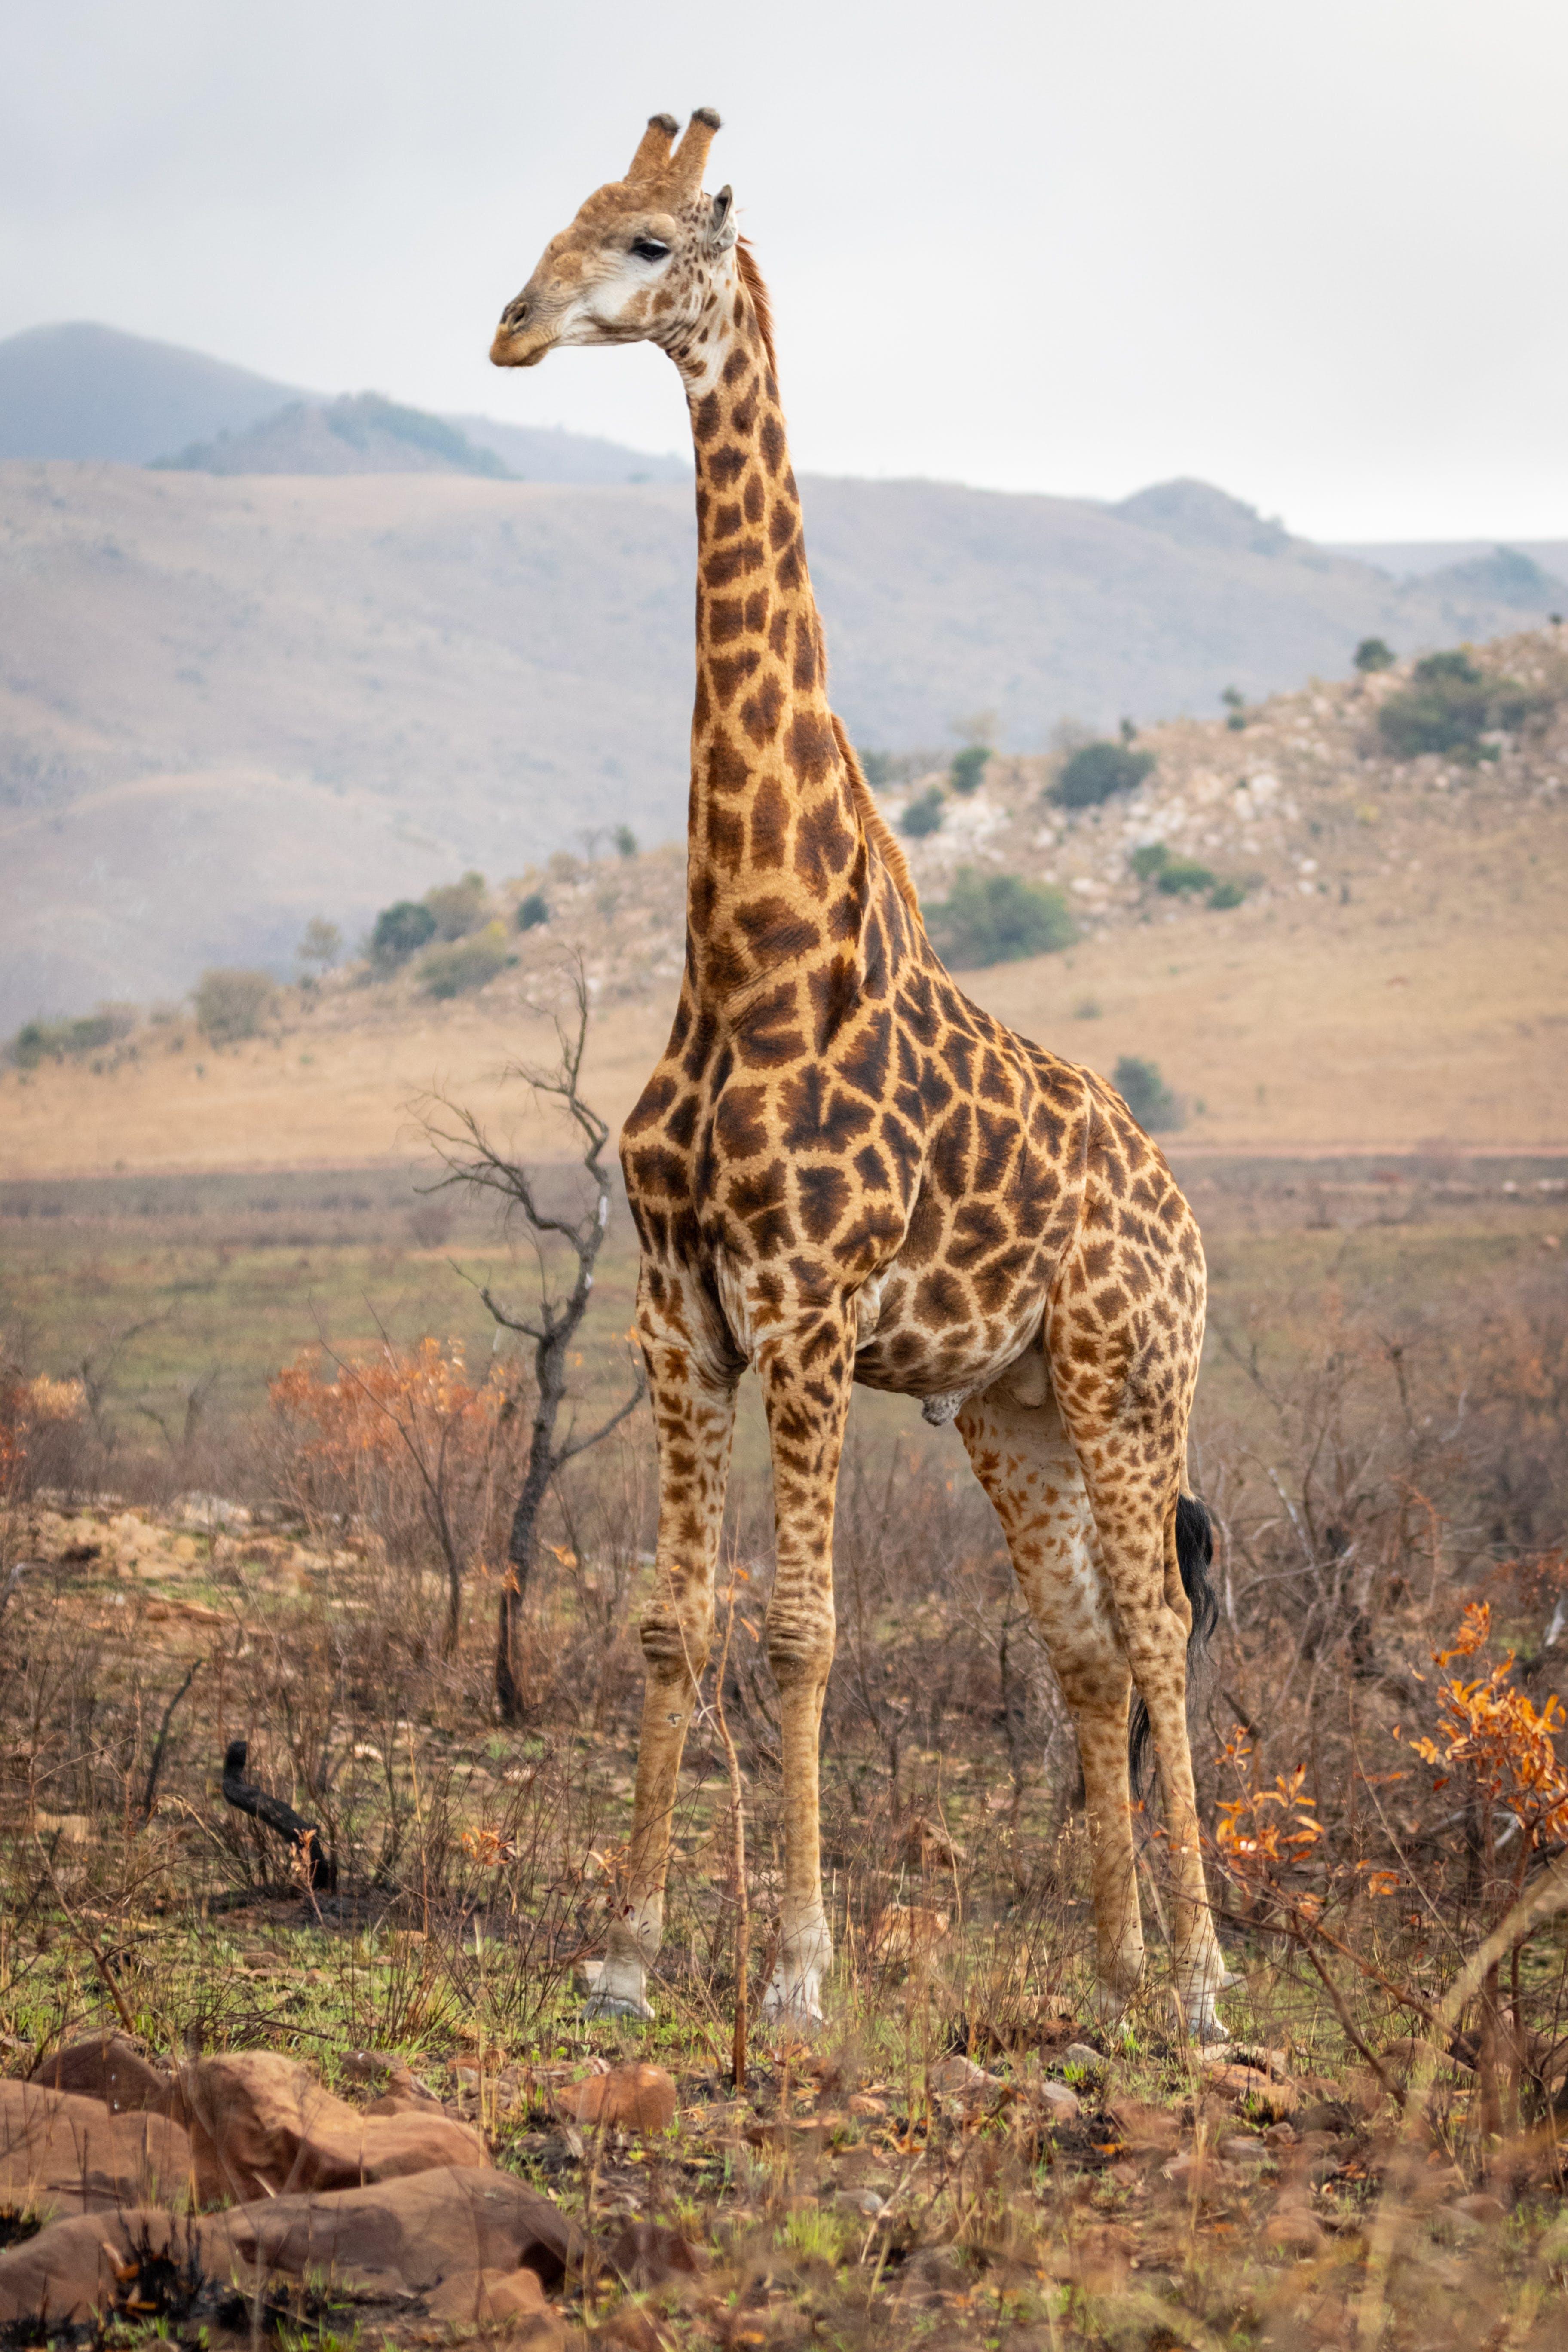 Photograph of Giraffe